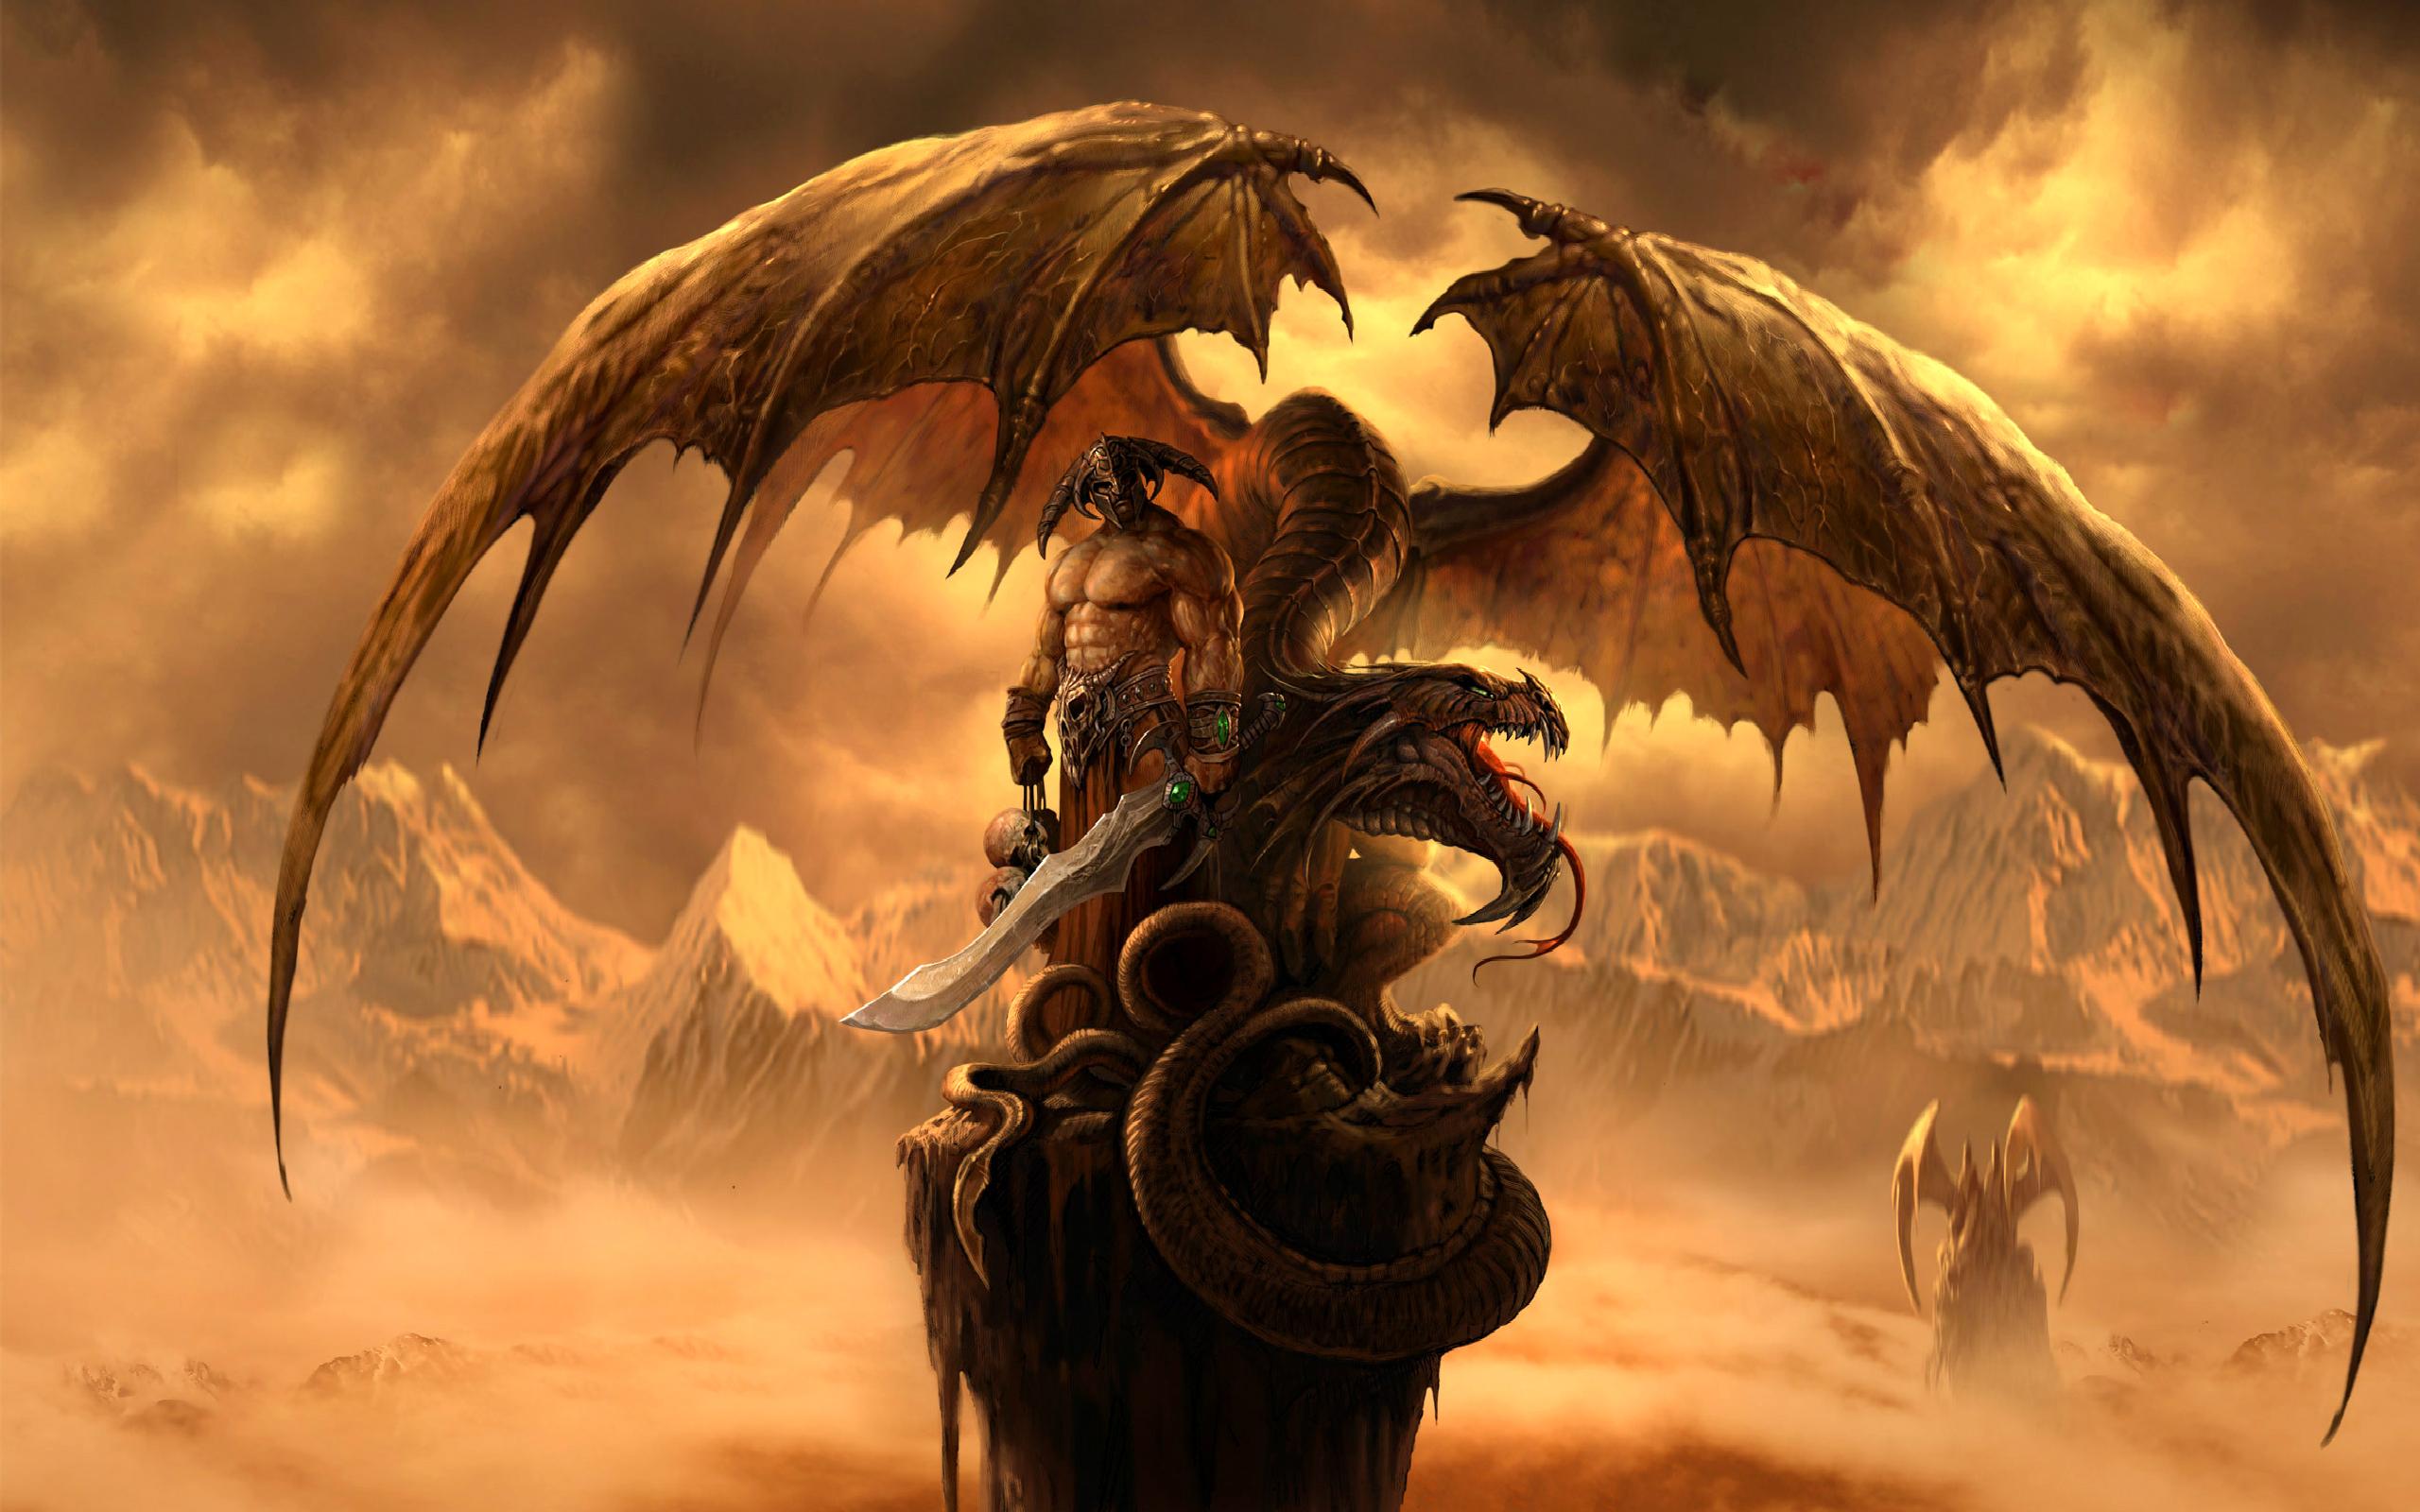 Fantasy Dragon dragons 27155090 2560 1600jpg 2560x1600